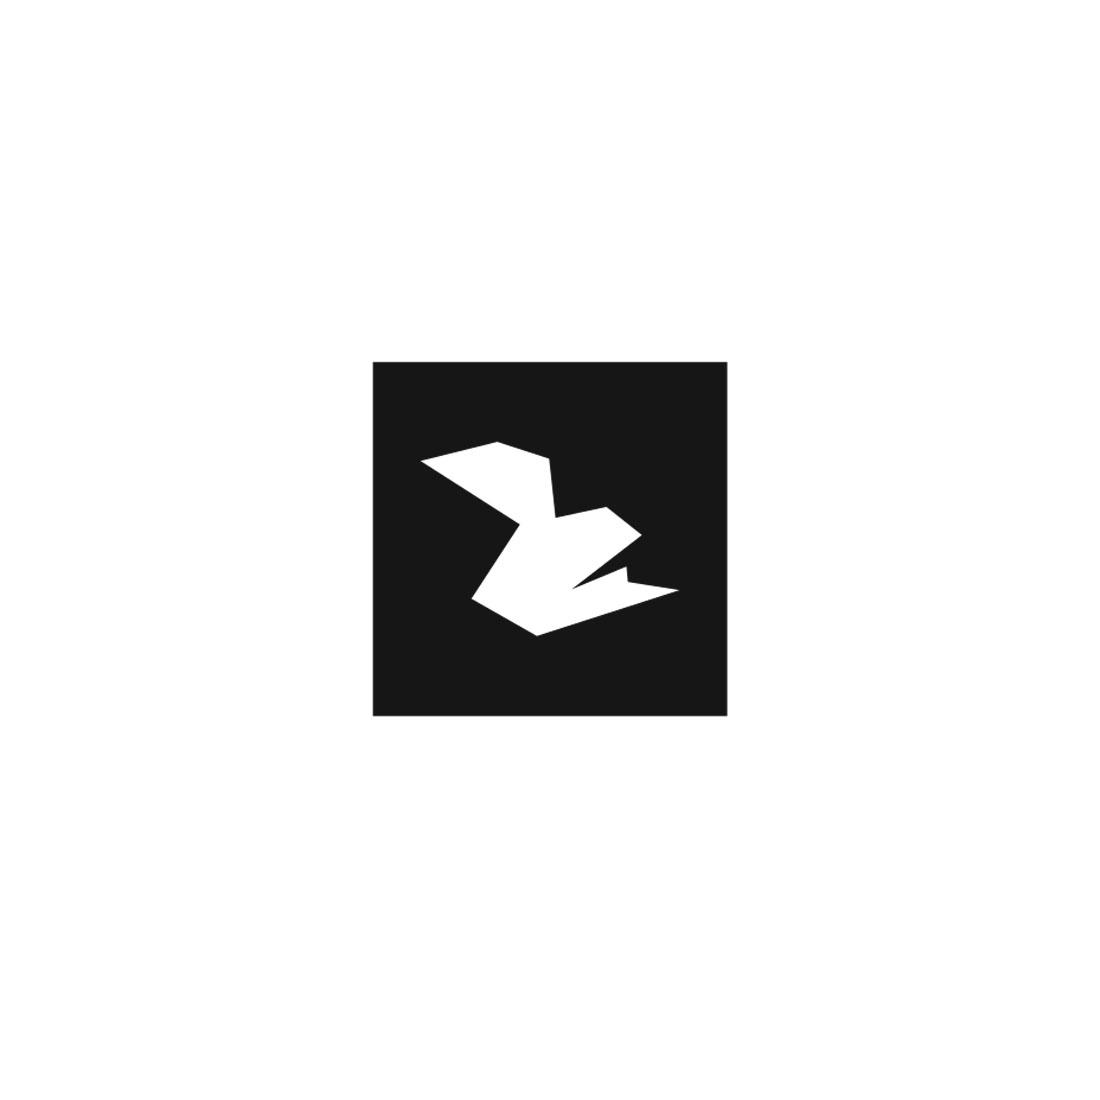 logo_caseArtboard 1 copy 16